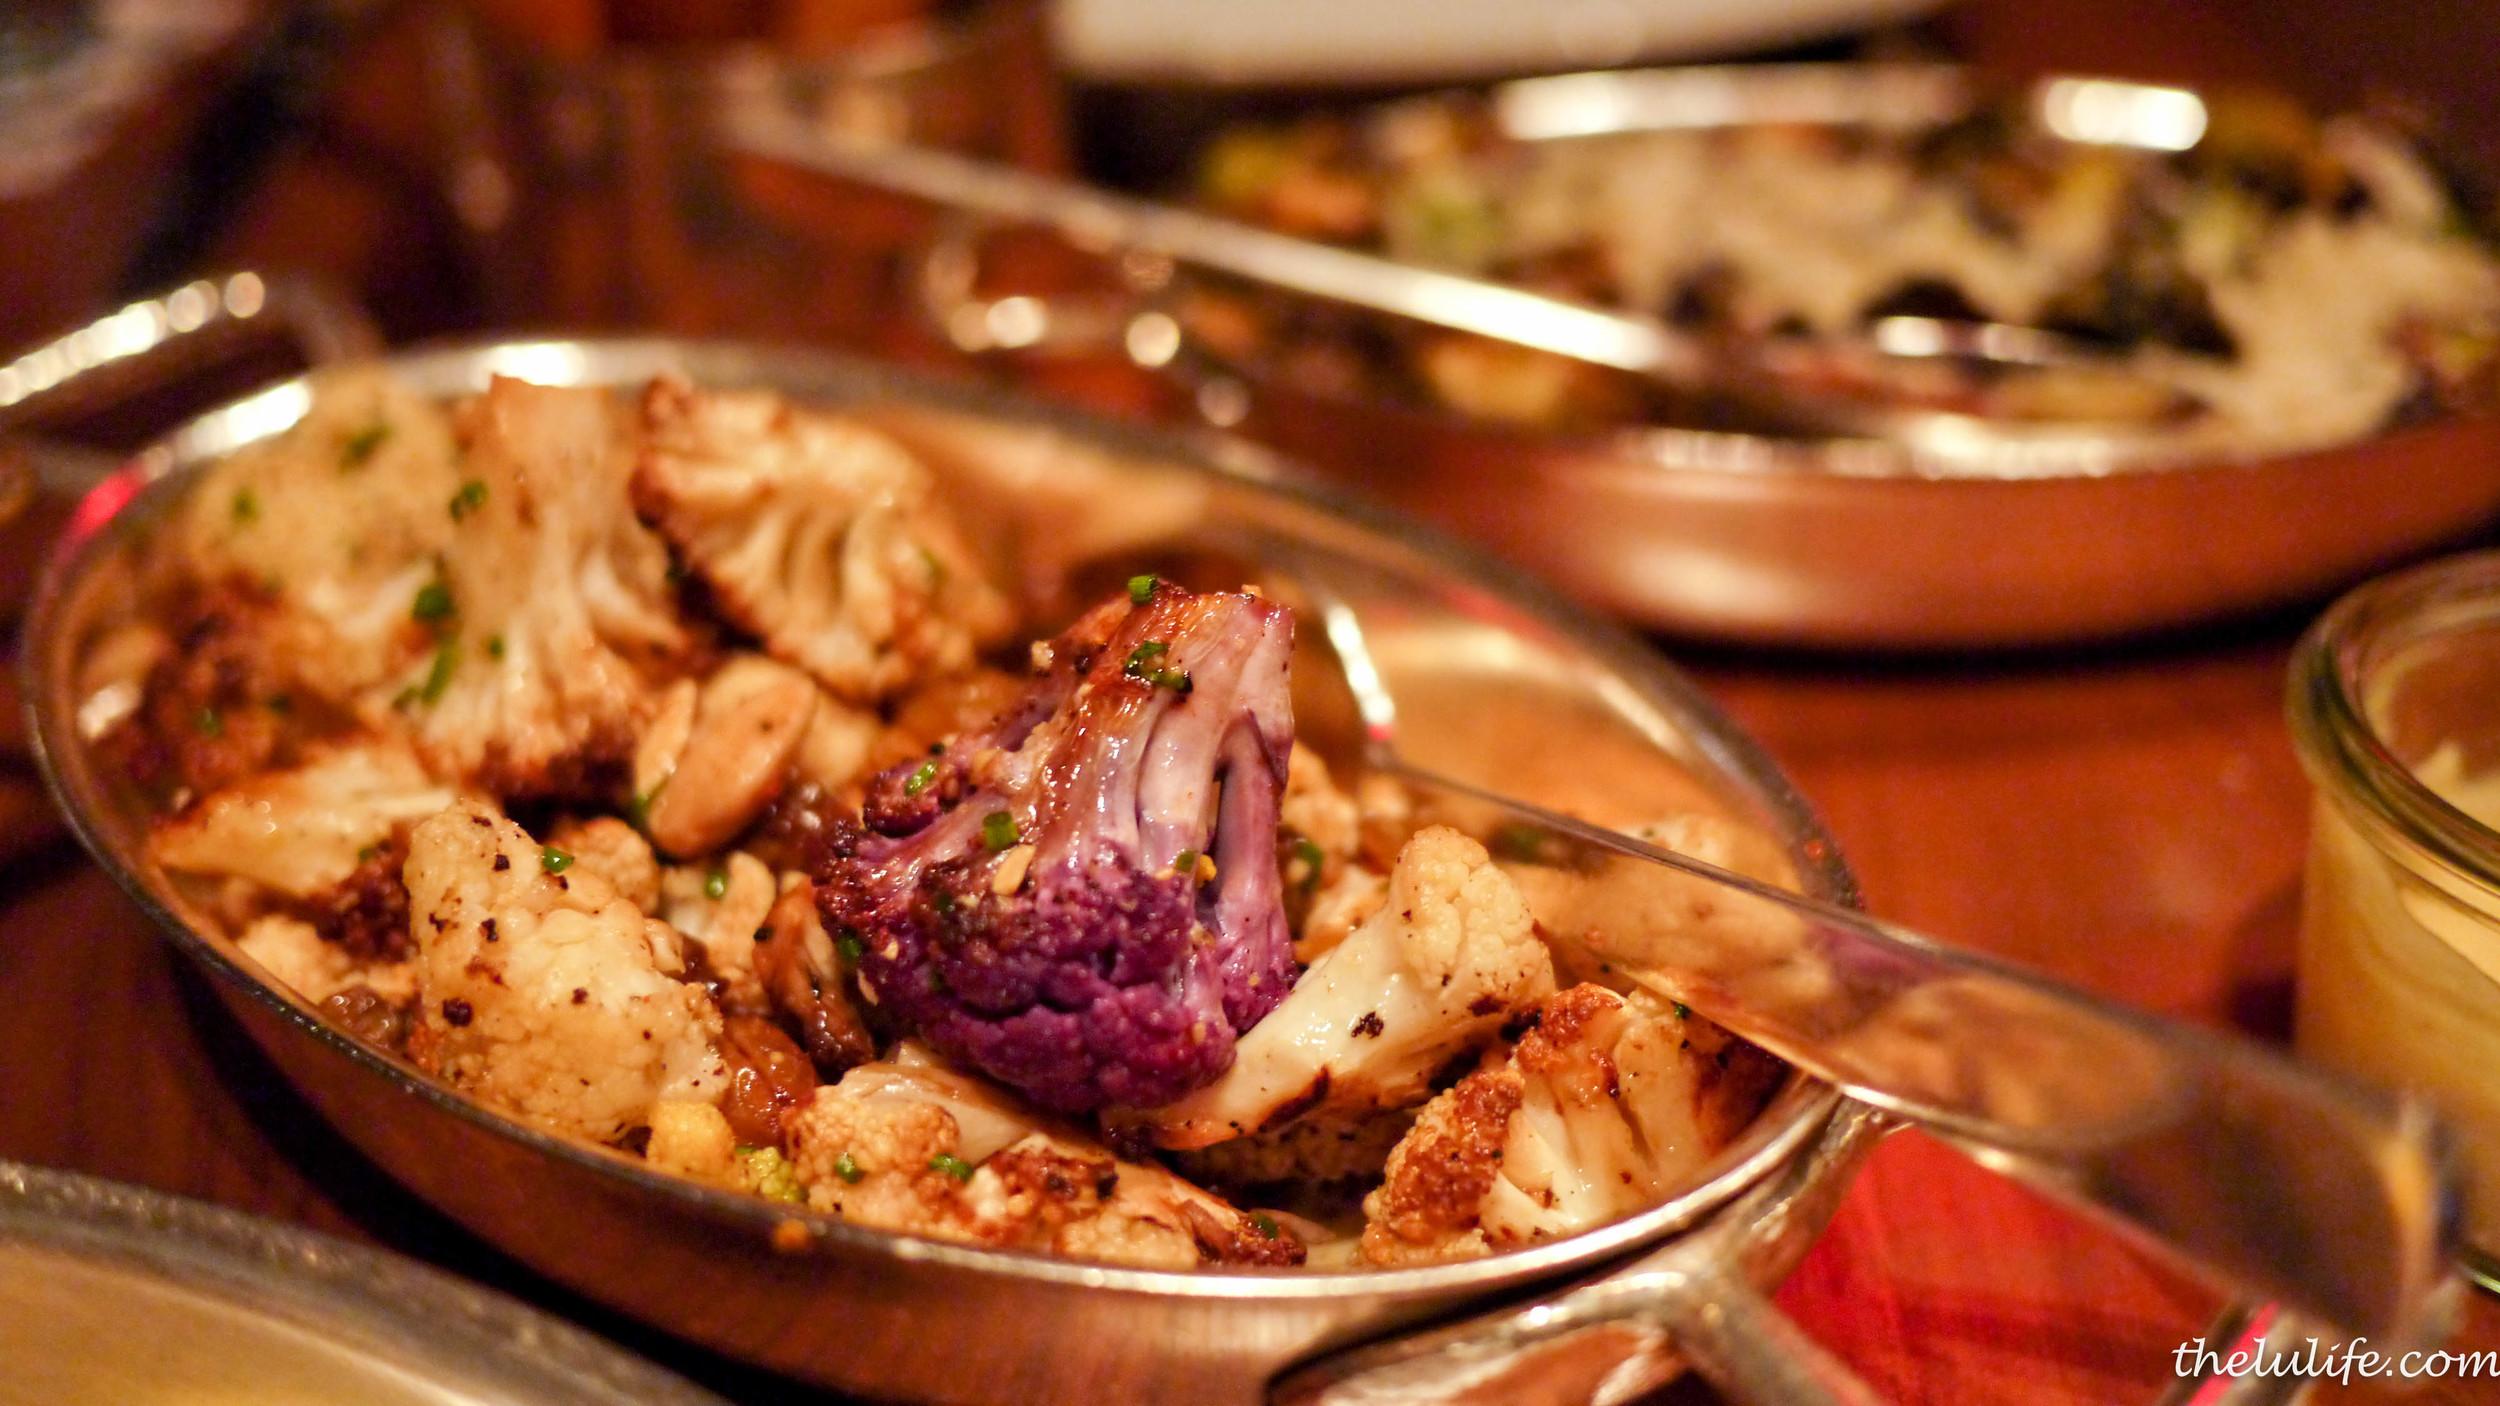 Foreground: Roasted cauliflower (with cheddar fondue, golden raisins, almonds)  Background: Crispy brussels sprouts (lemon, caper, pecorino)